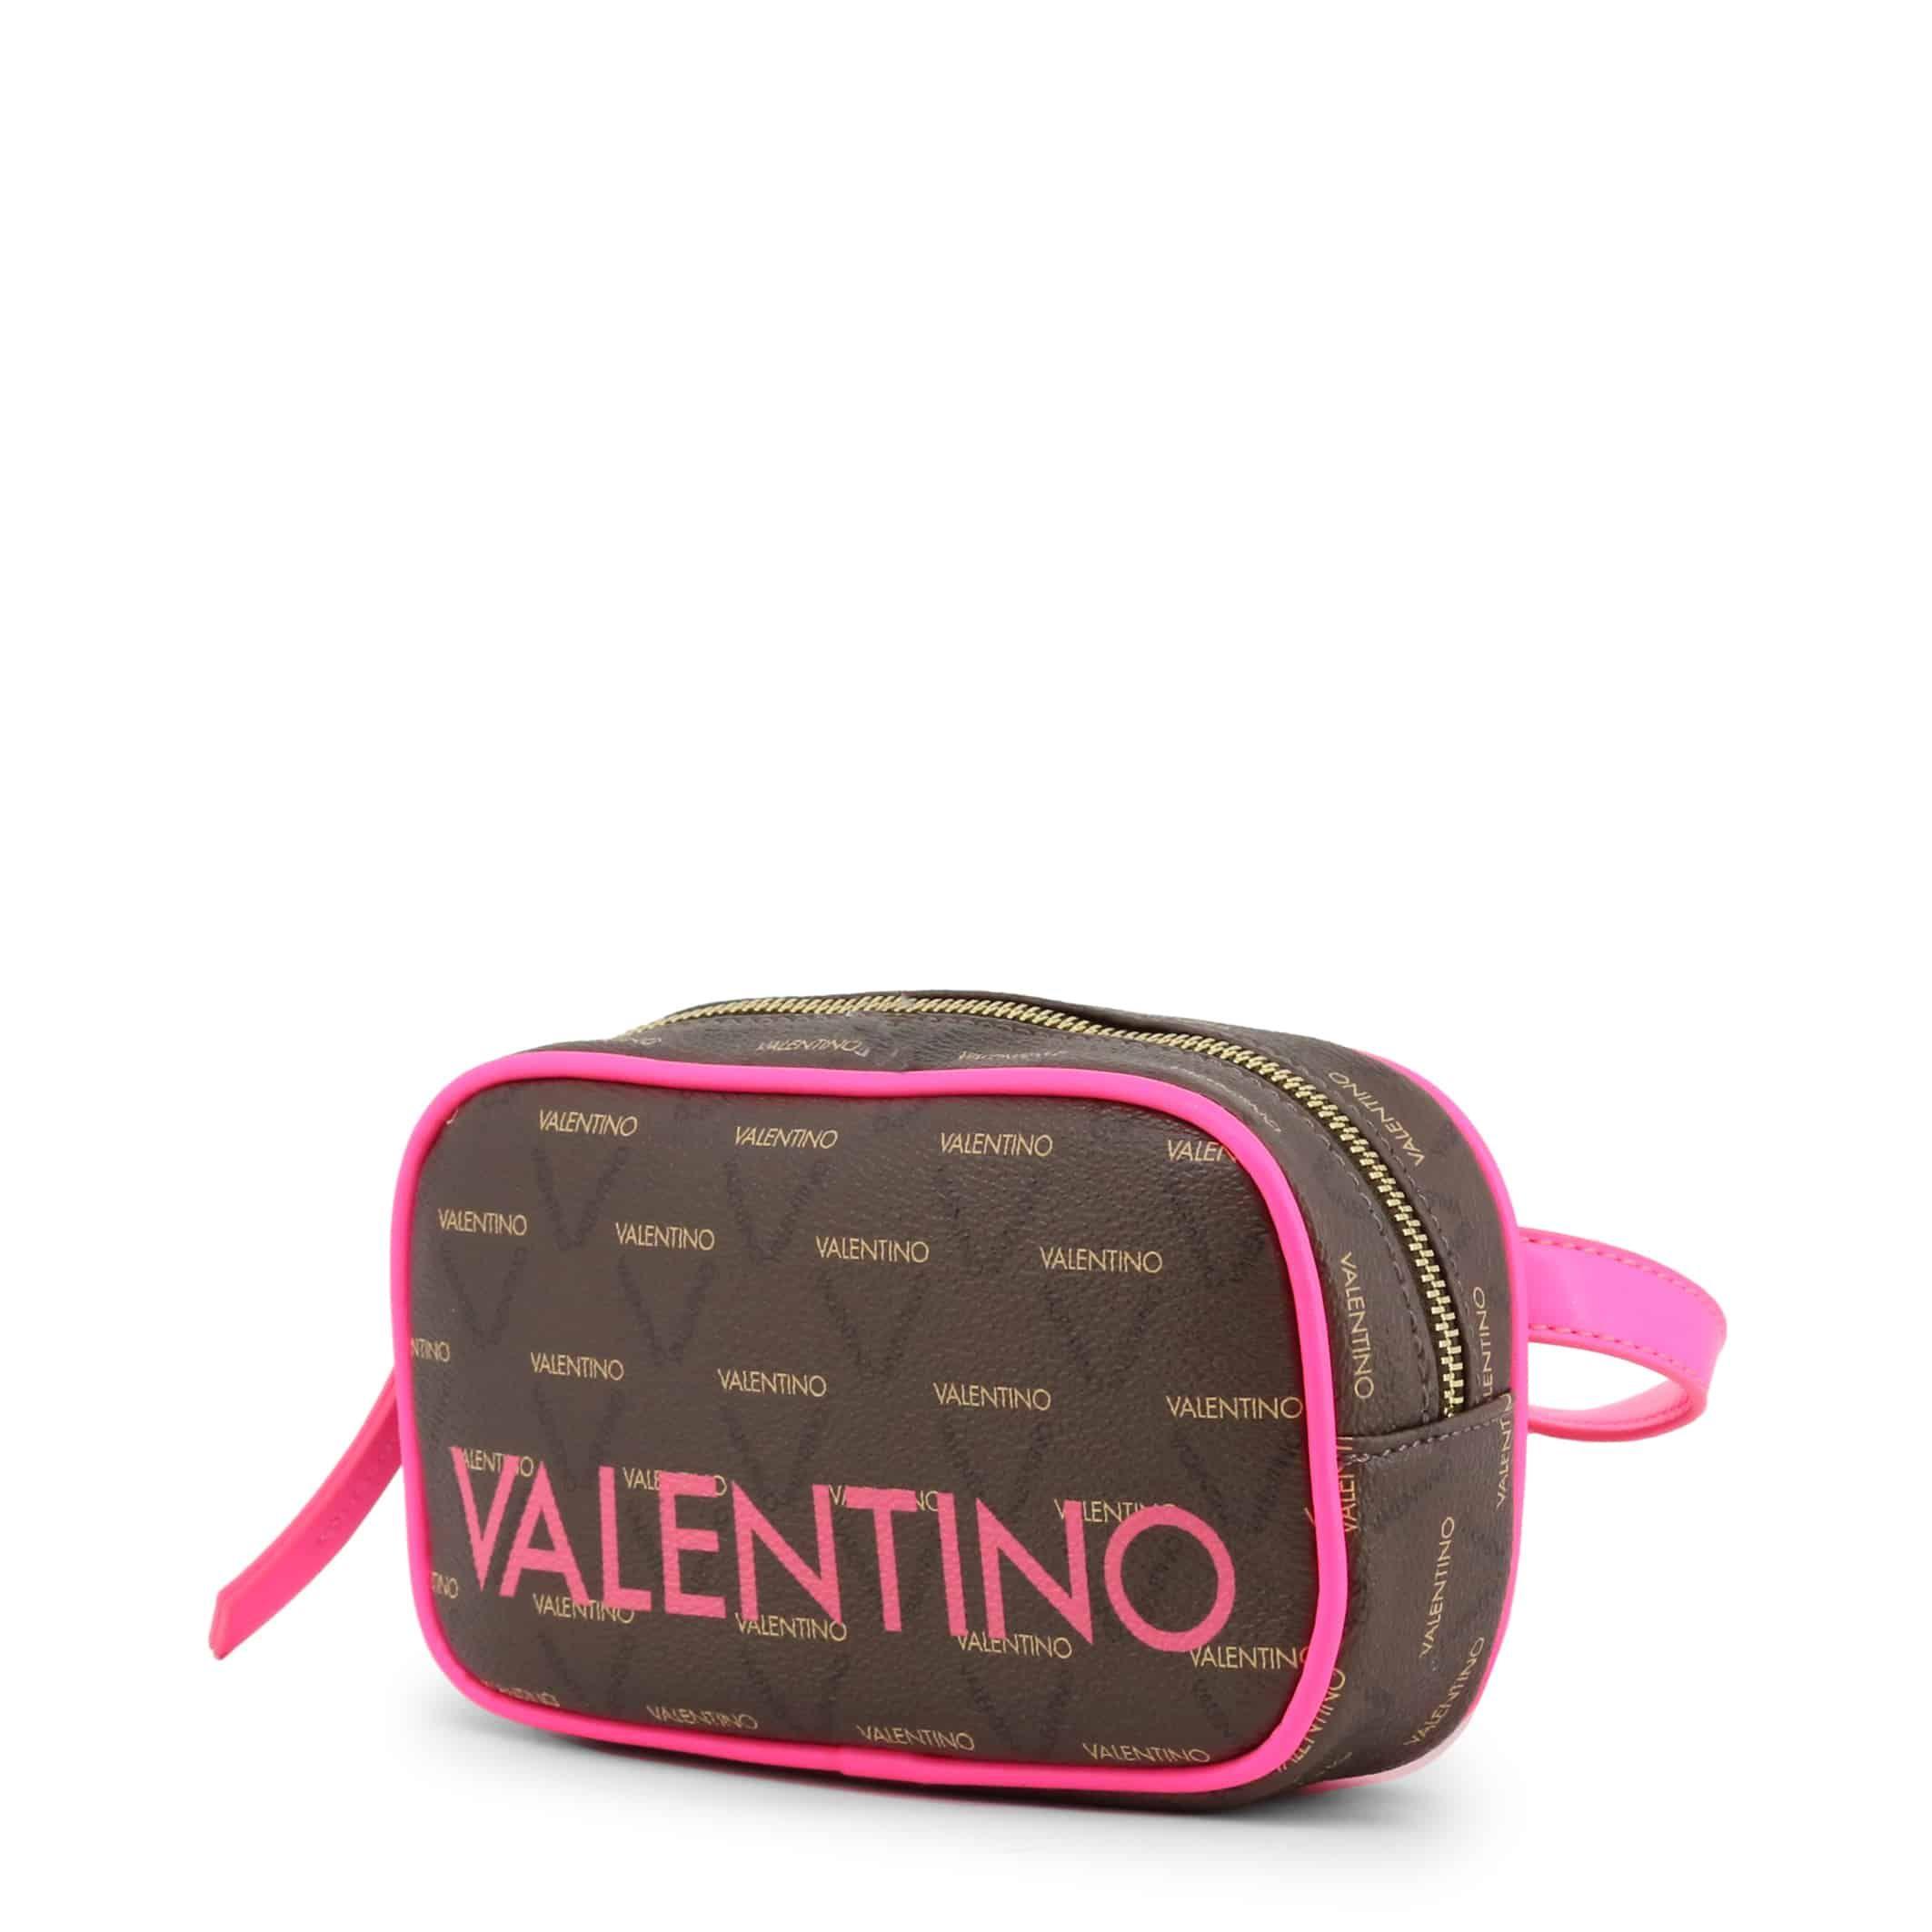 Valentino by Mario Valentino – LIUTOFLUO-VBS46820